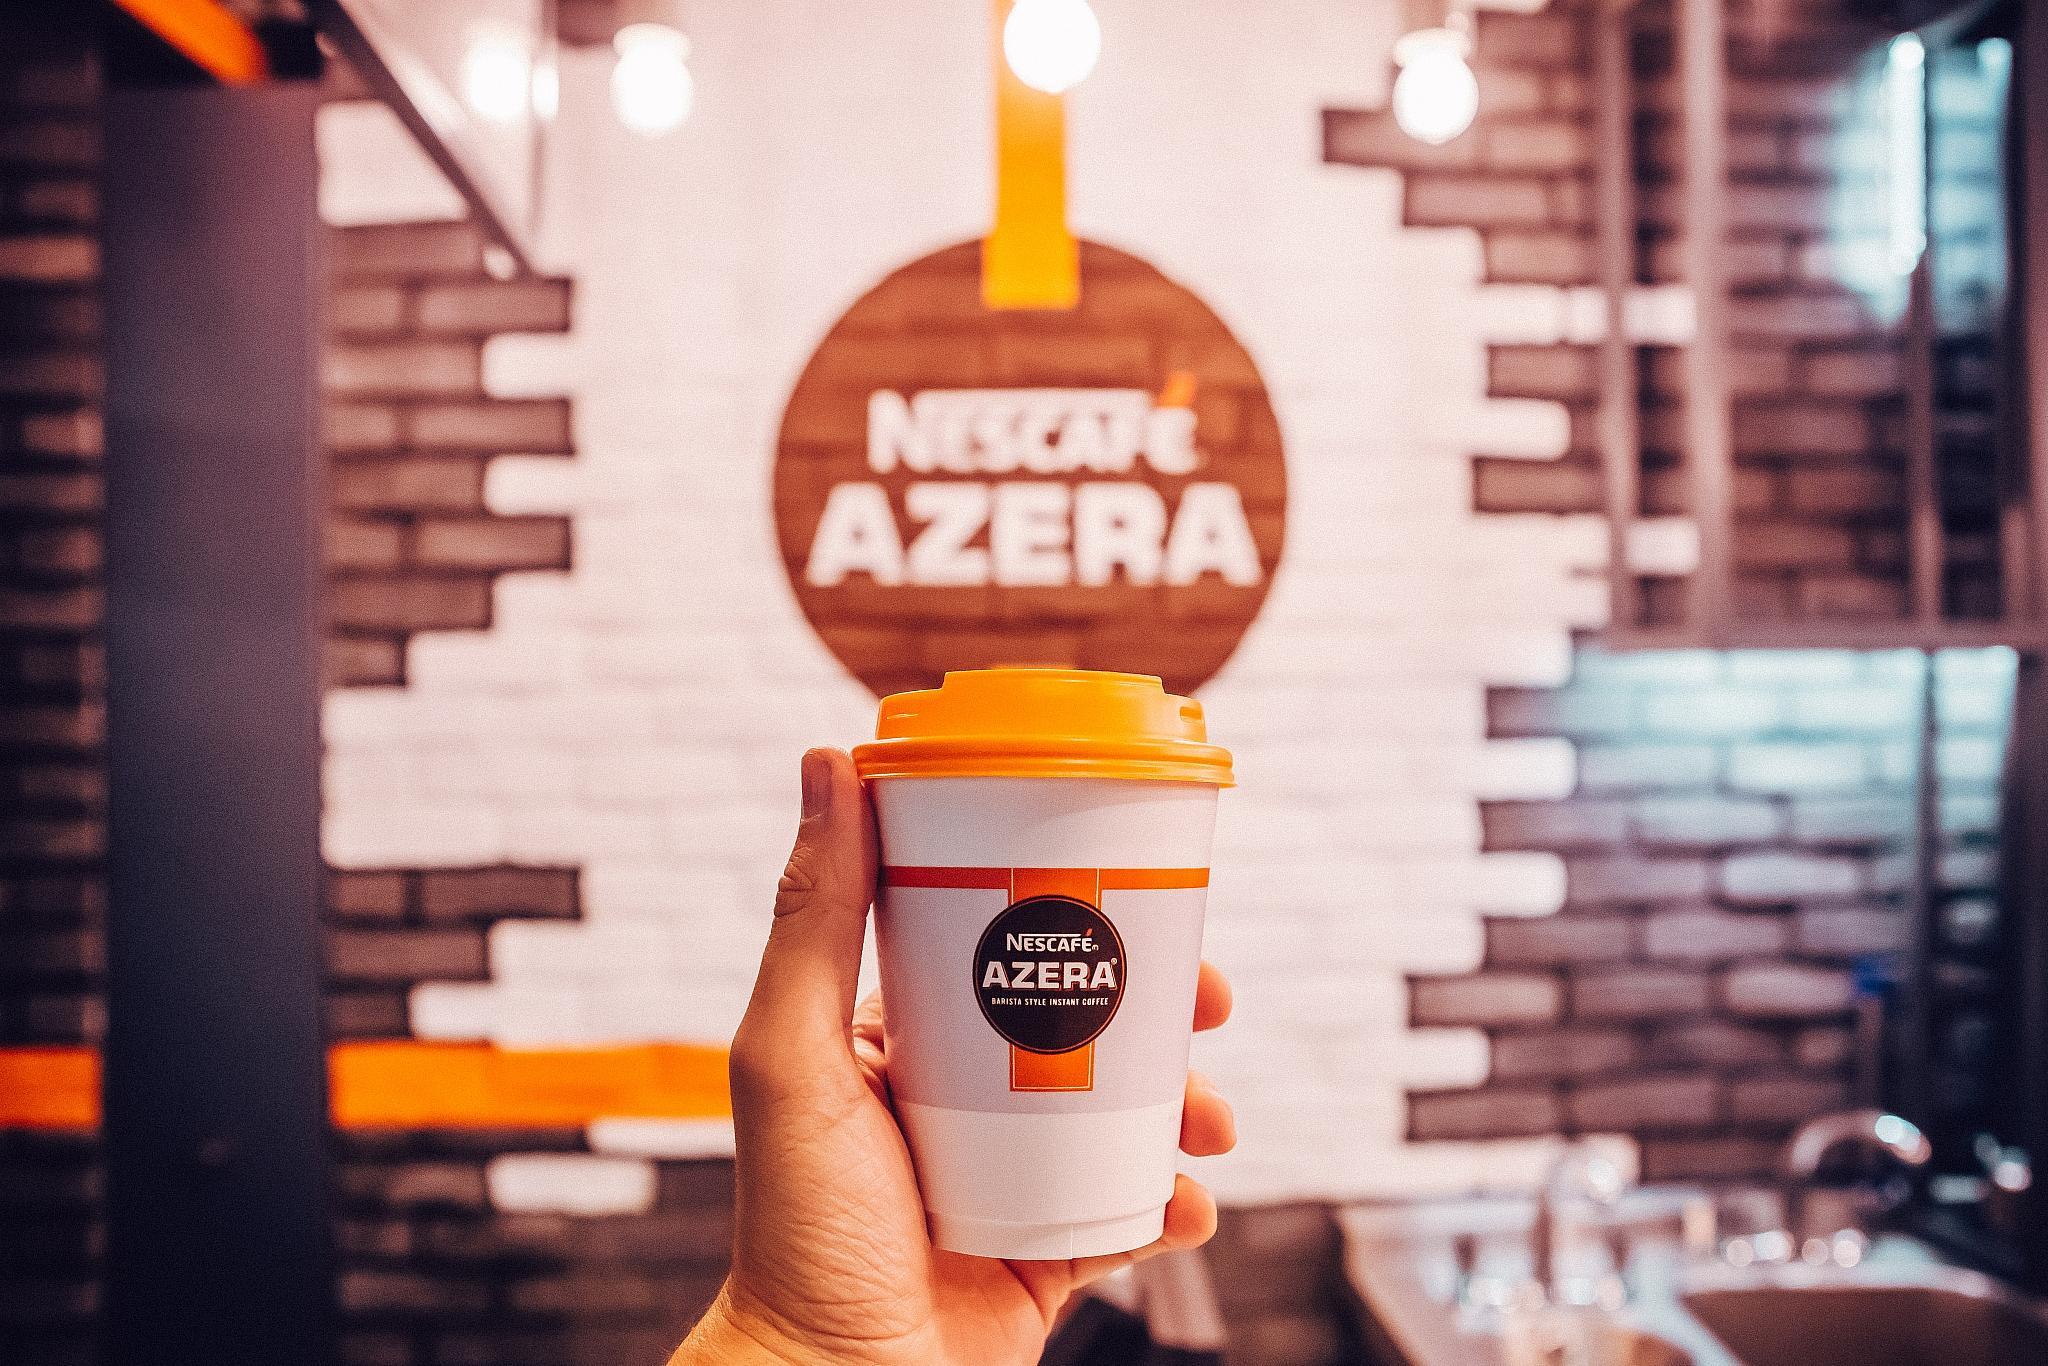 The O2 - Nescafe Azera - 11th October 2018 by Luke Dyson - IMG_0097.jpg